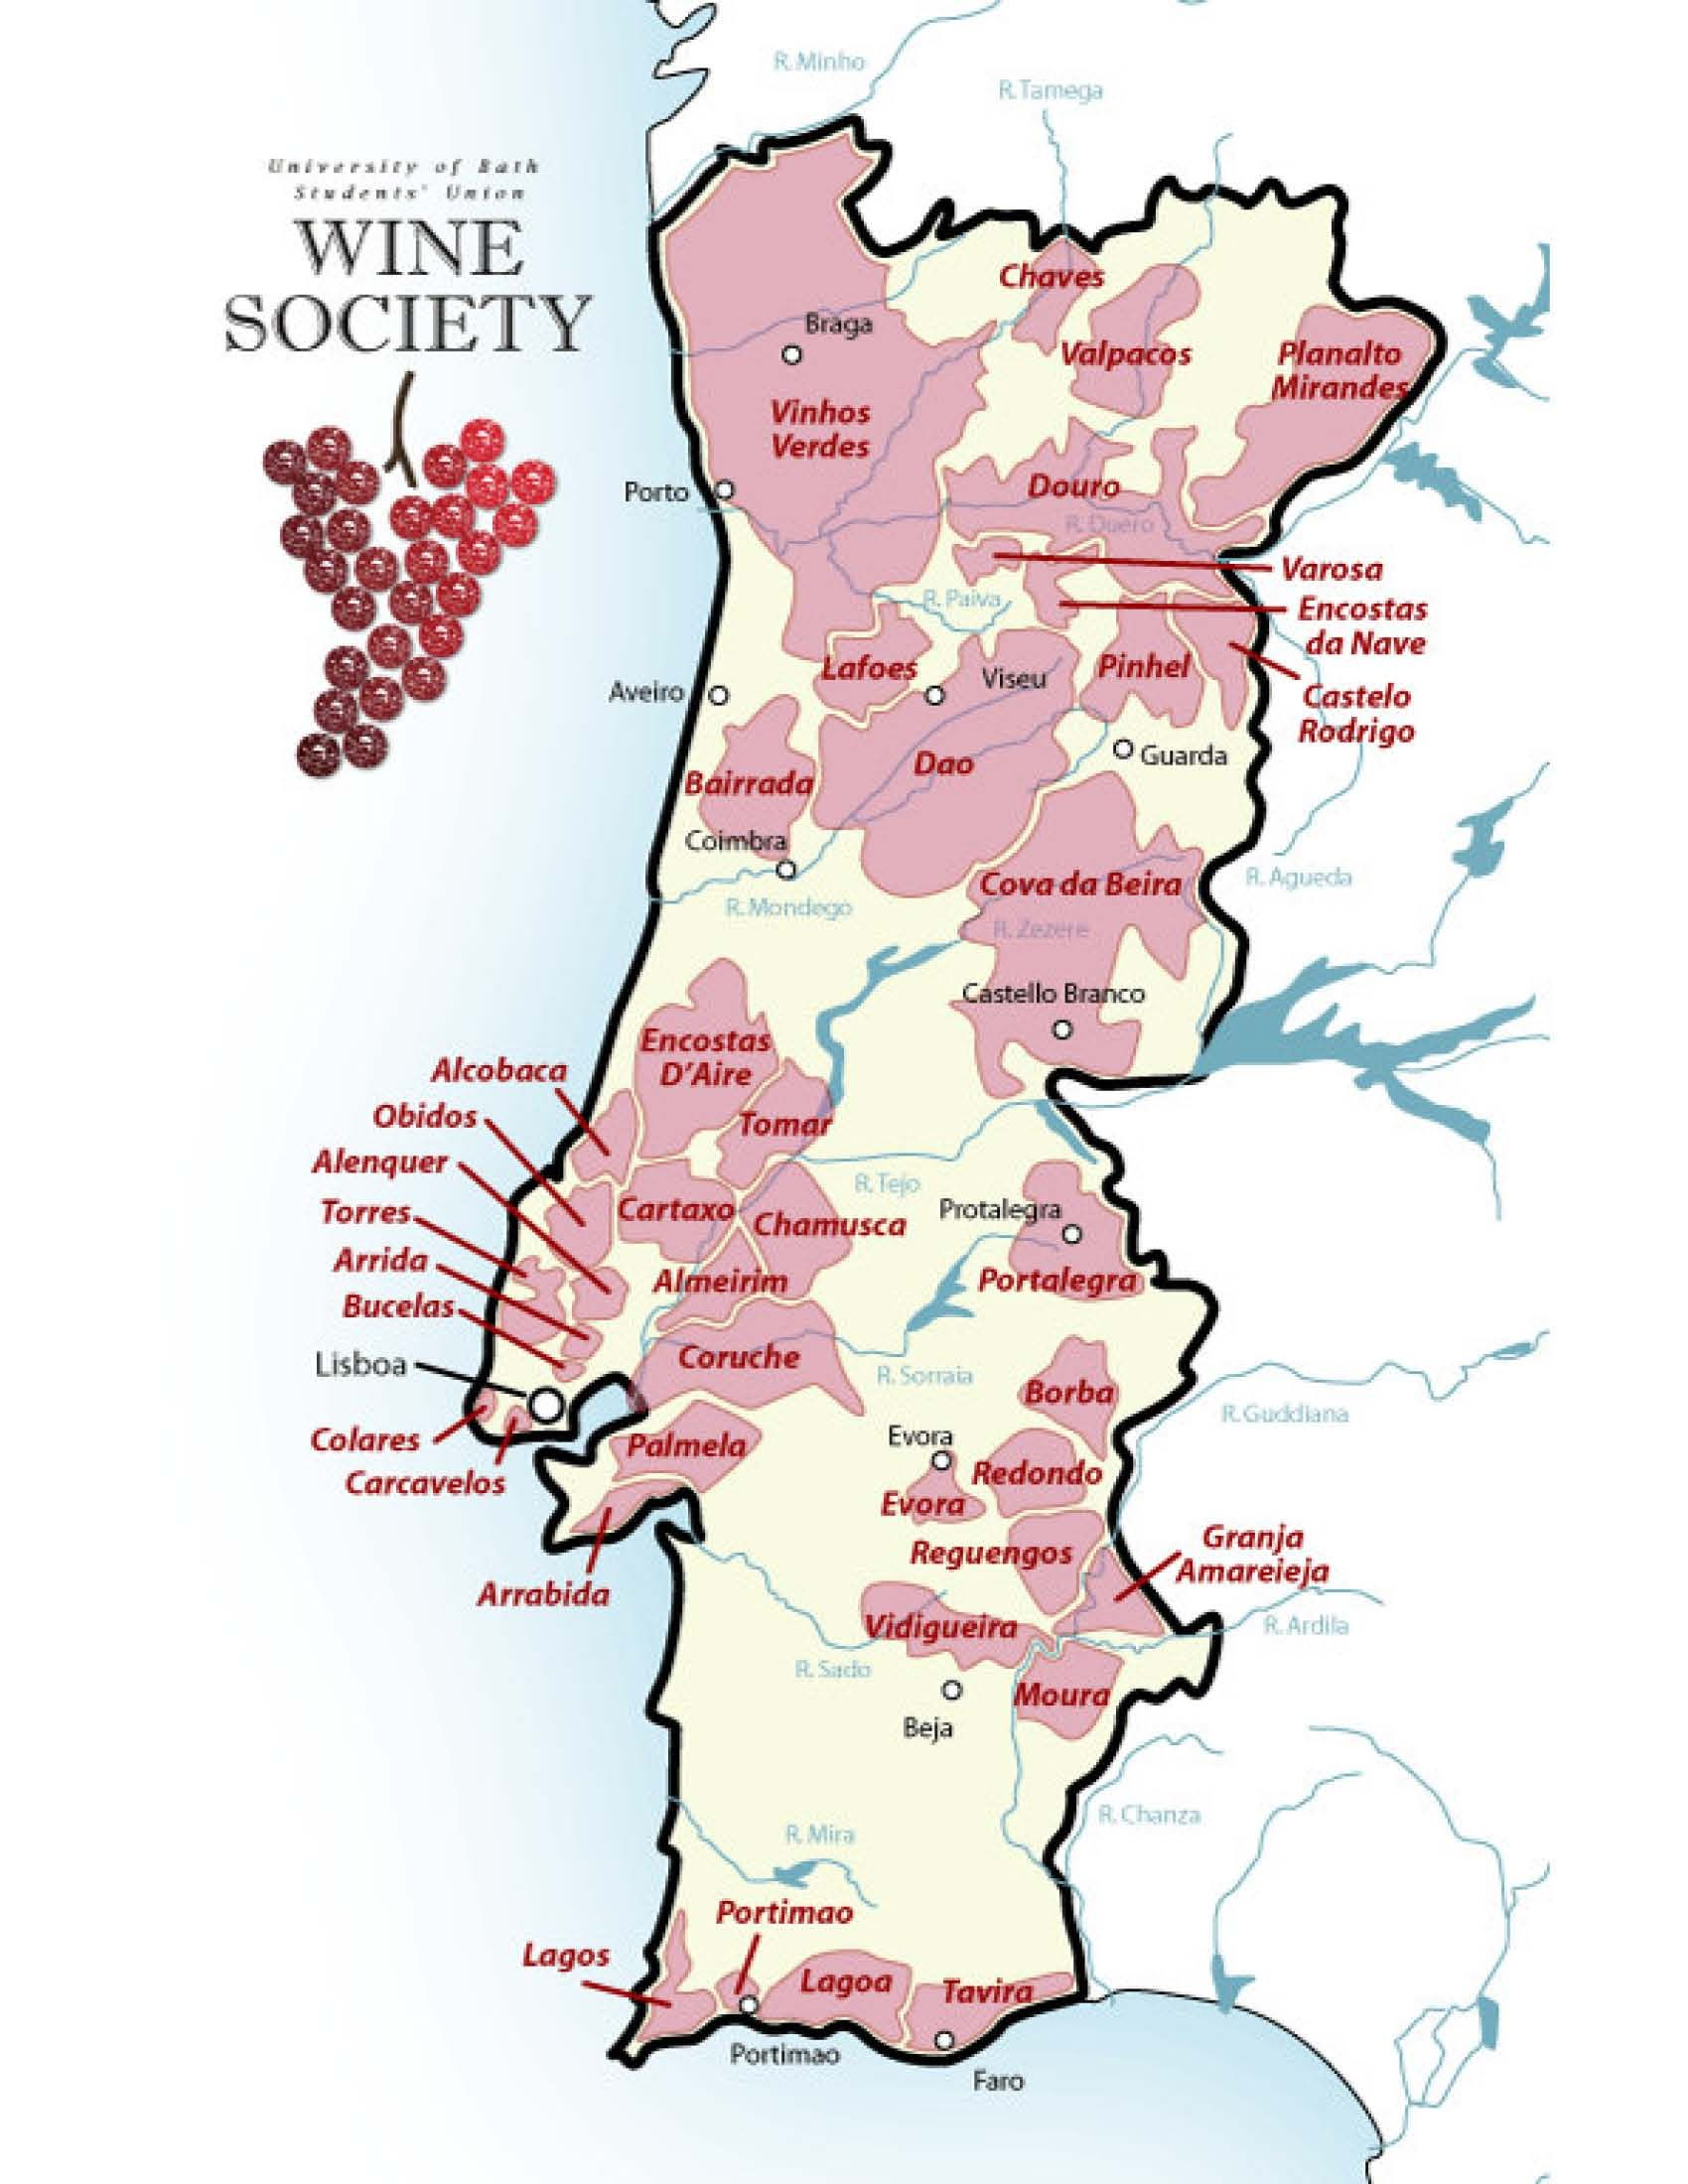 Pin By Jorge Artola On Regiones Vitivinicolas Wine Region Maps